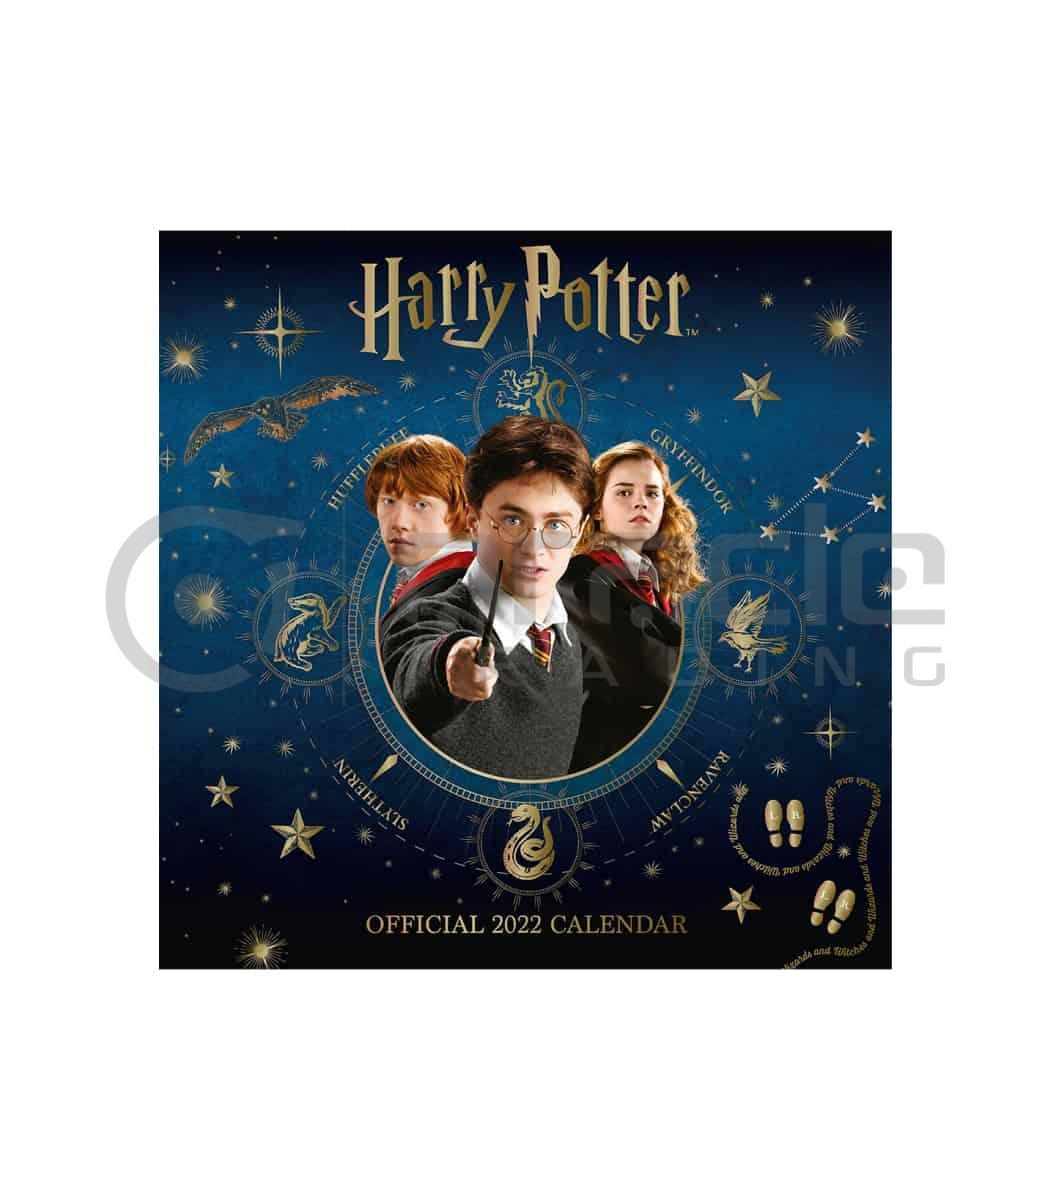 Harry Potter 2022 Calendar (OCT Delivery)